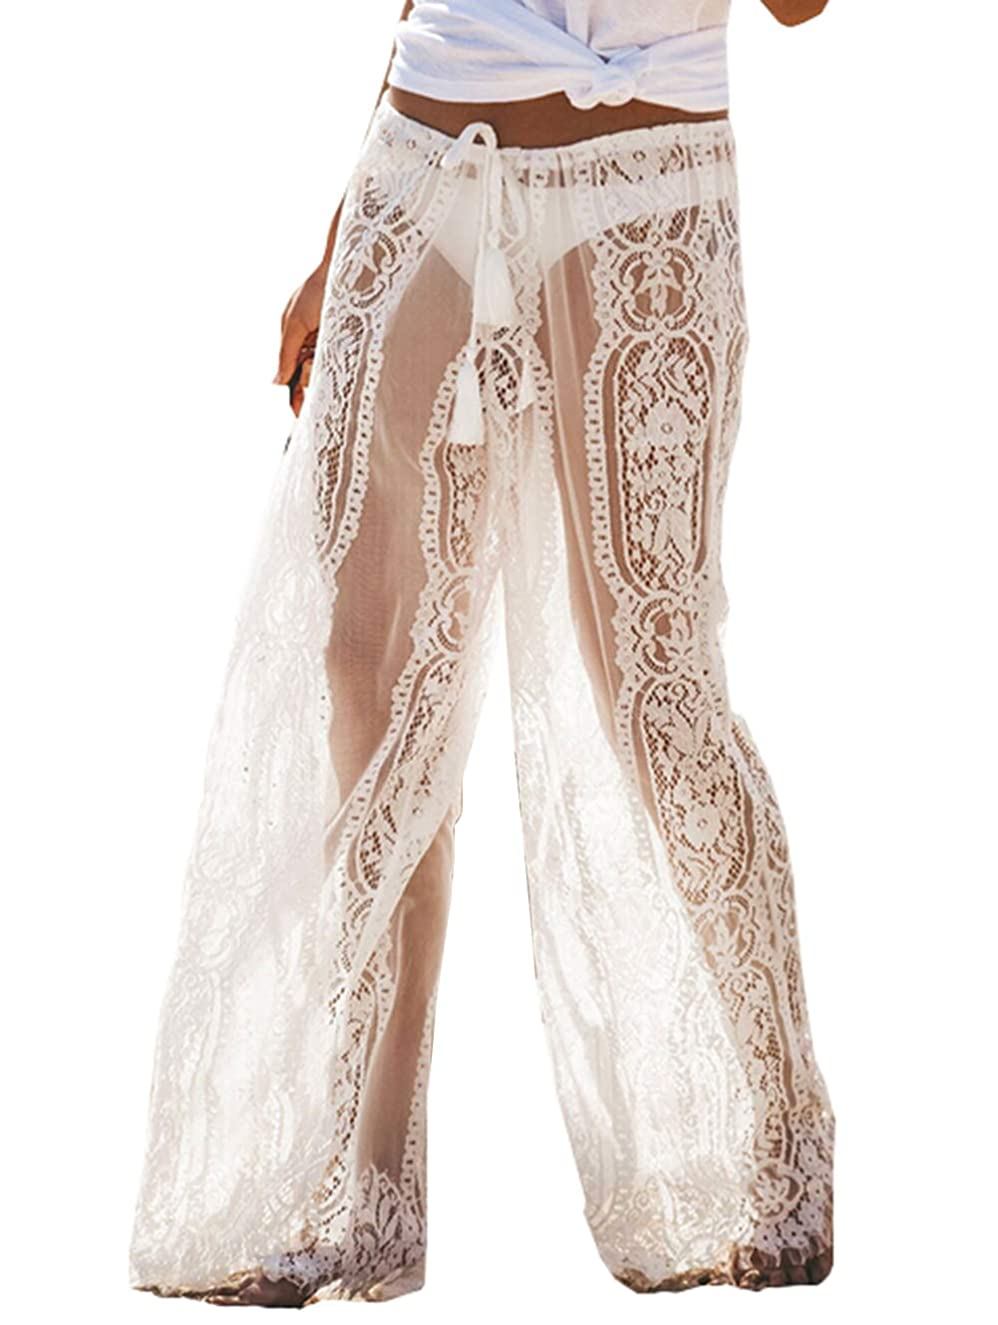 Lioraitiin Womens Crochet Lace Throughout High Waist Loose Pants Beach Bikini Cover Up Swim Trousers